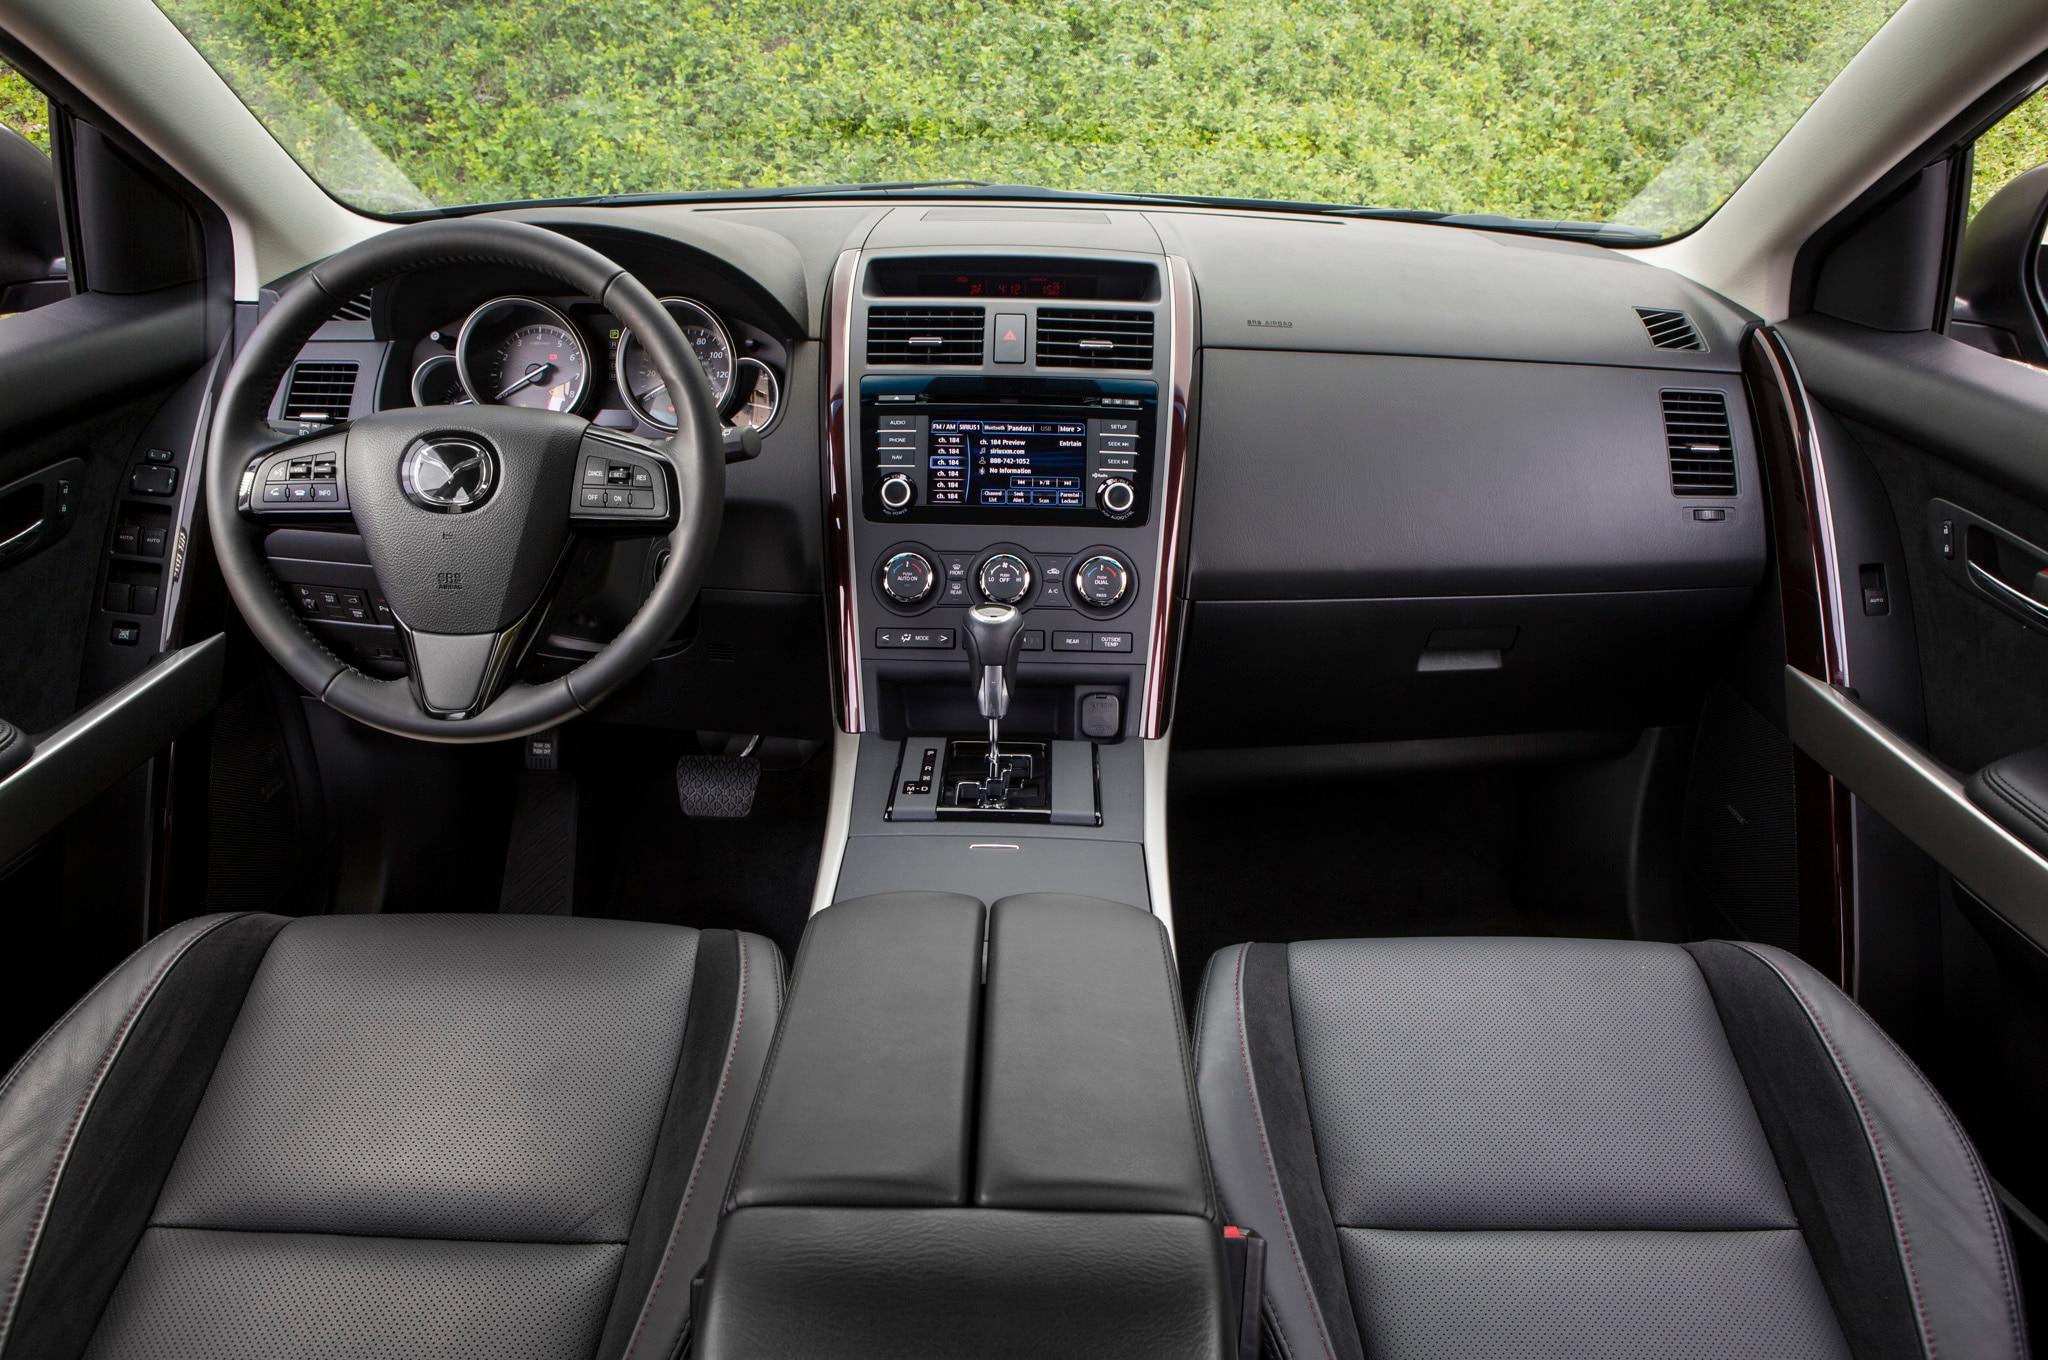 http://st.automobilemag.com/uploads/sites/10/2015/09/2013-Mazda-CX-9-Front-Interior.jpg